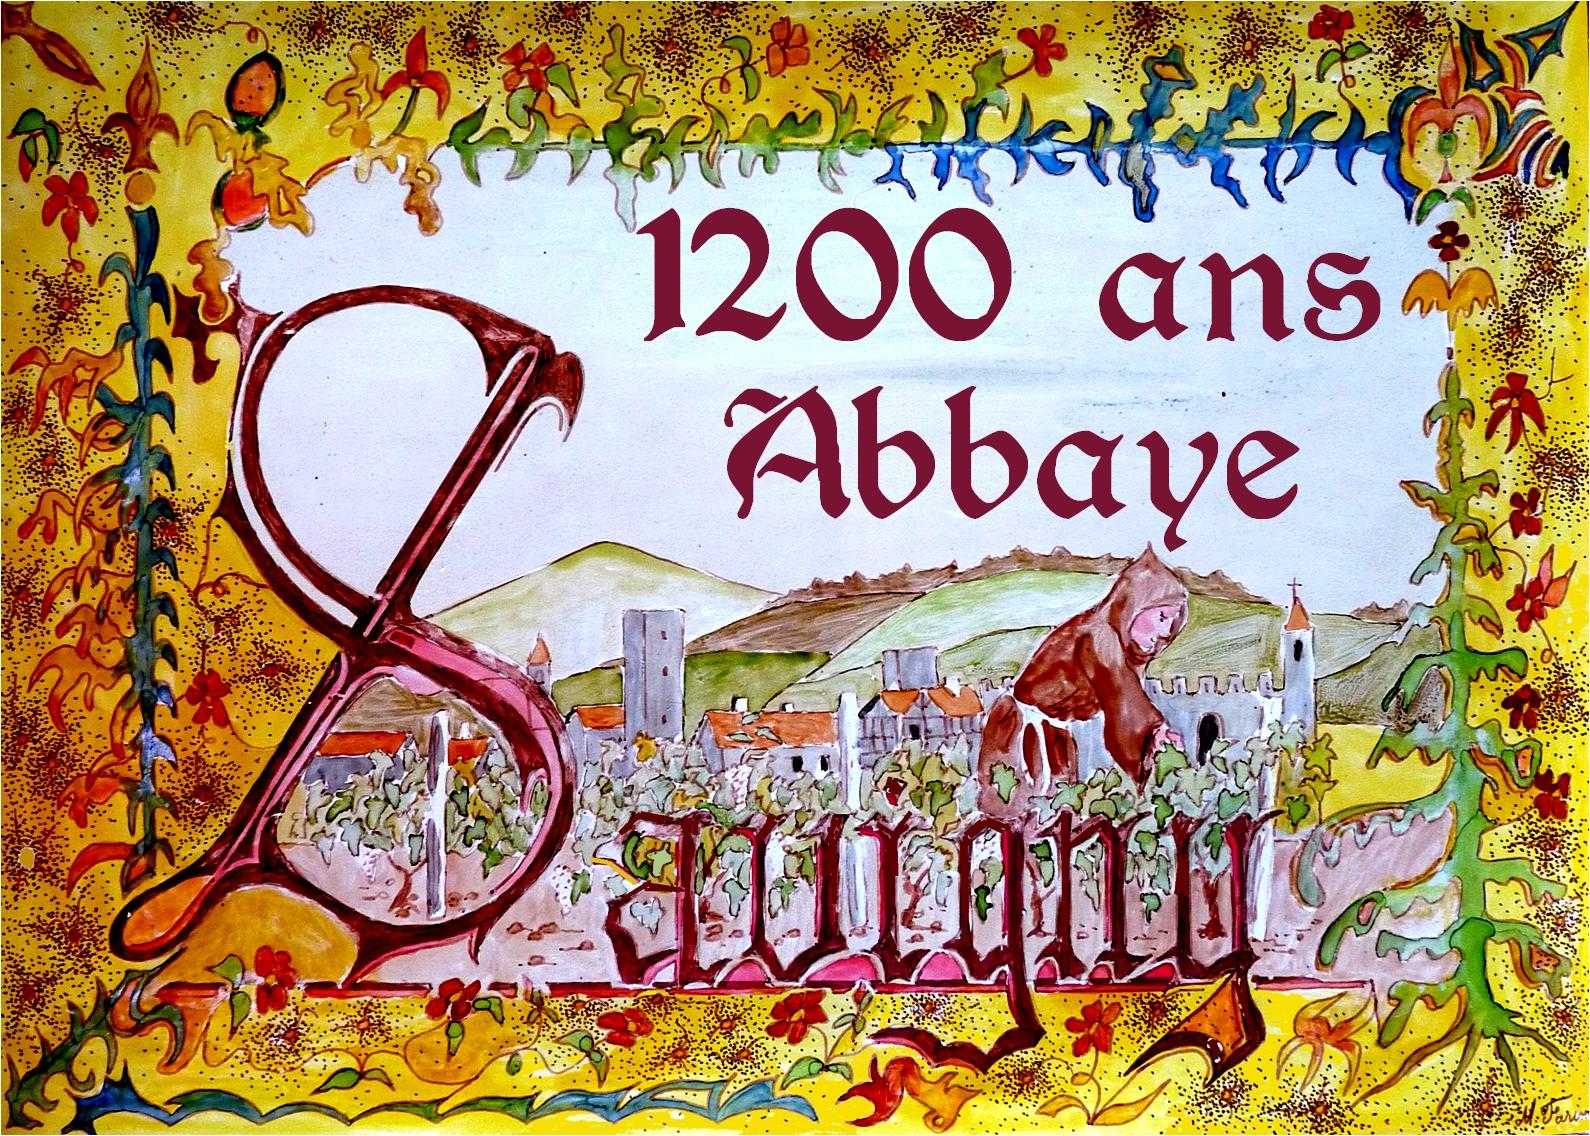 1200 ans abbaye de savigny savigny 69210 sur le portail m di val. Black Bedroom Furniture Sets. Home Design Ideas